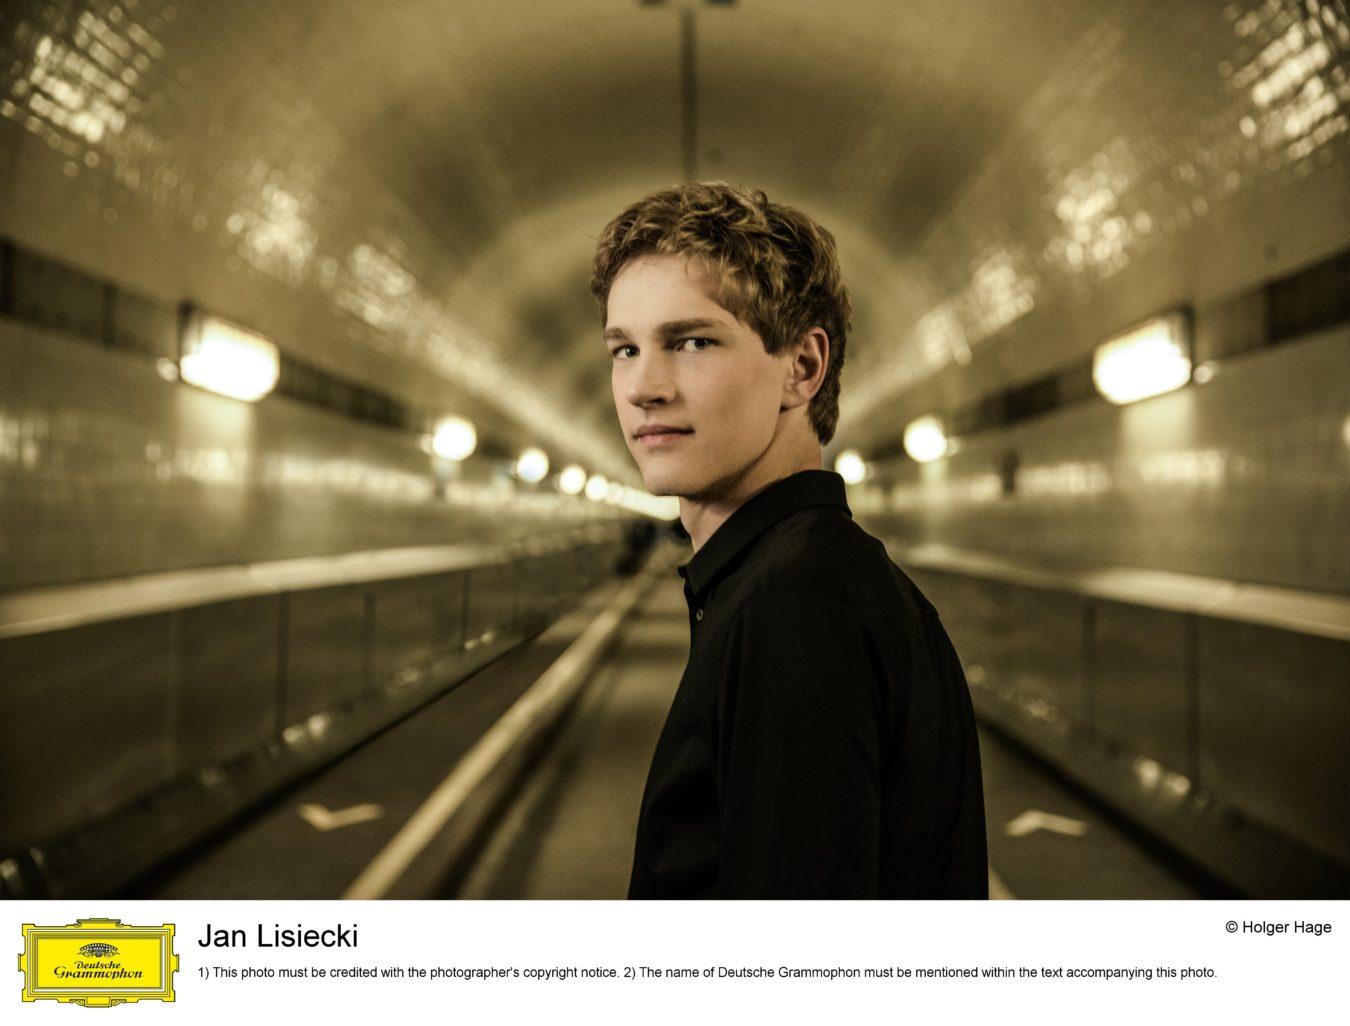 Jan Lisiecki © Holger Hage / DG